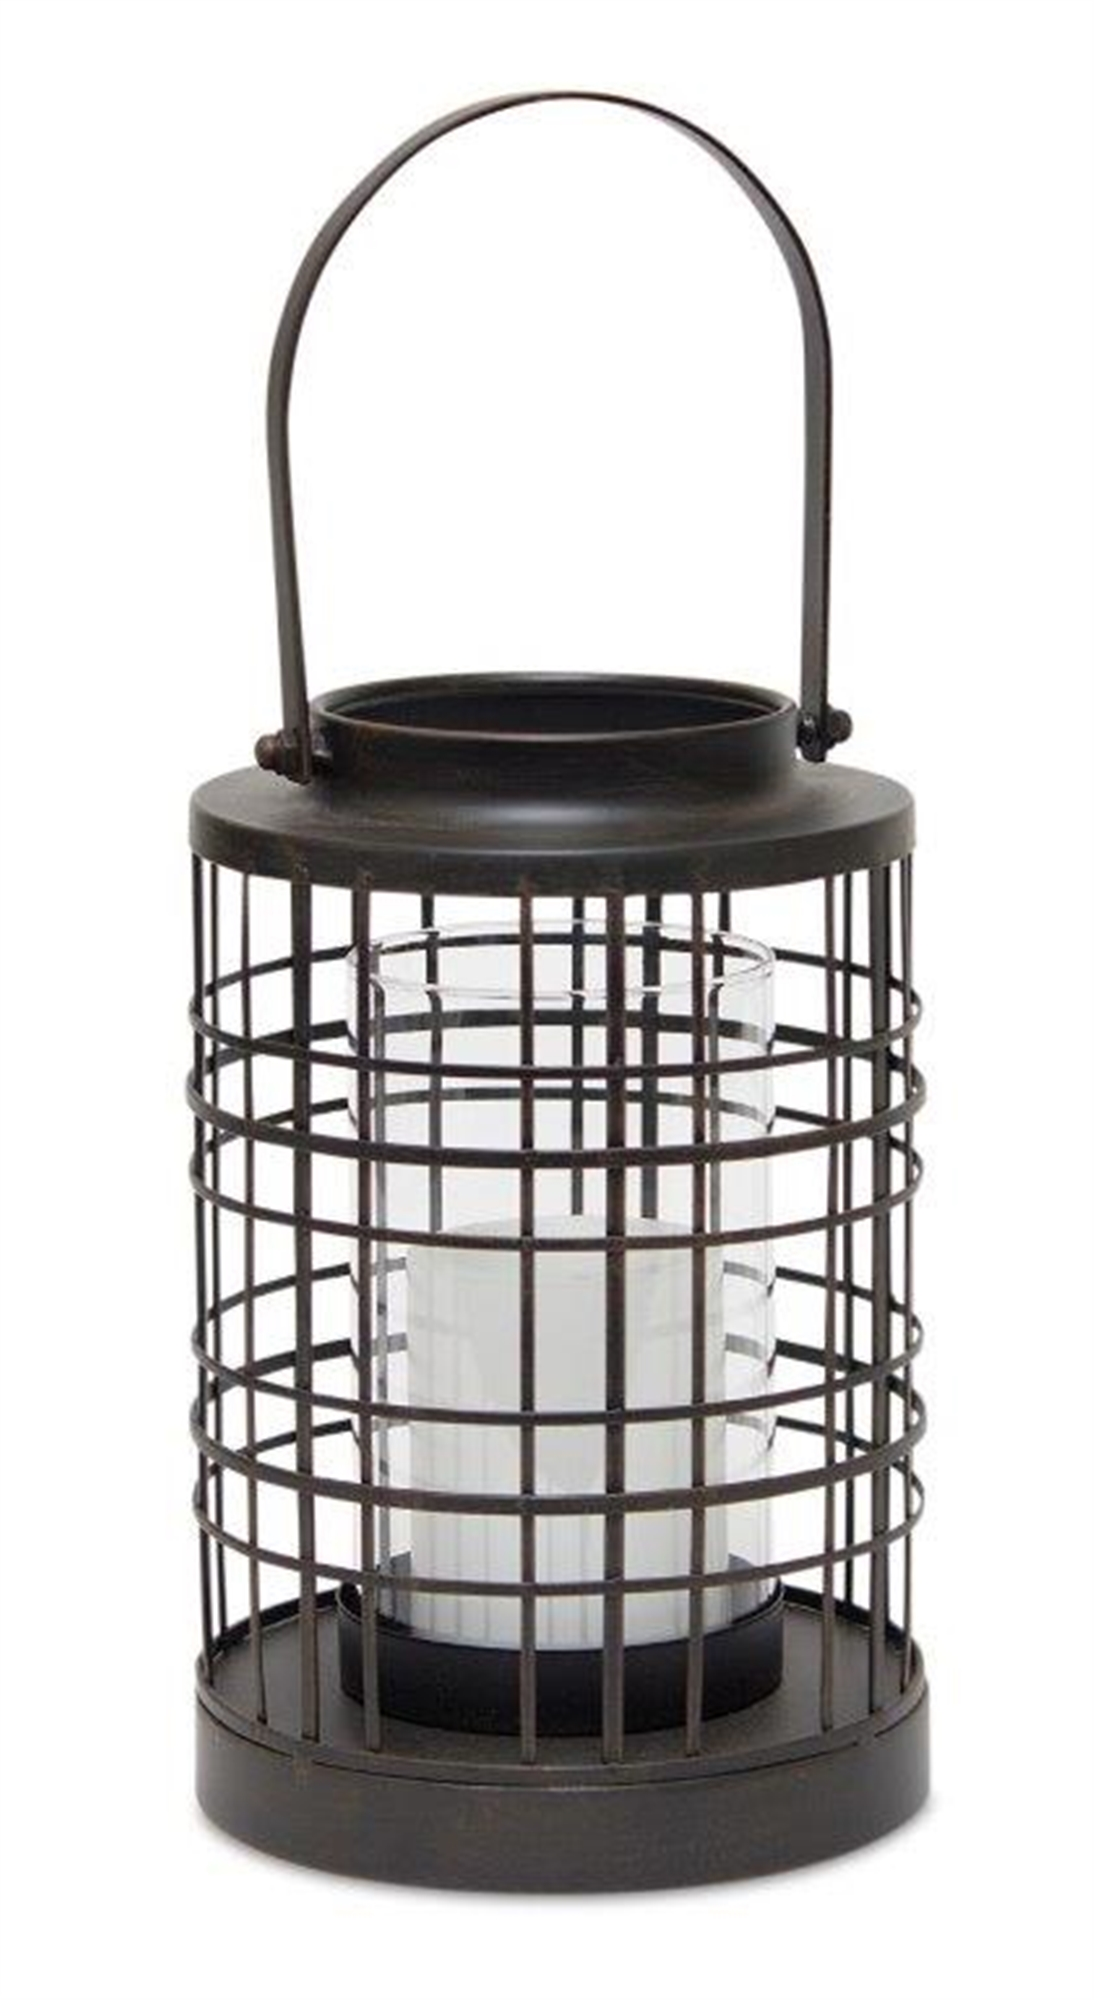 "Lantern 7""D x 14.75""H Iron/Glass"